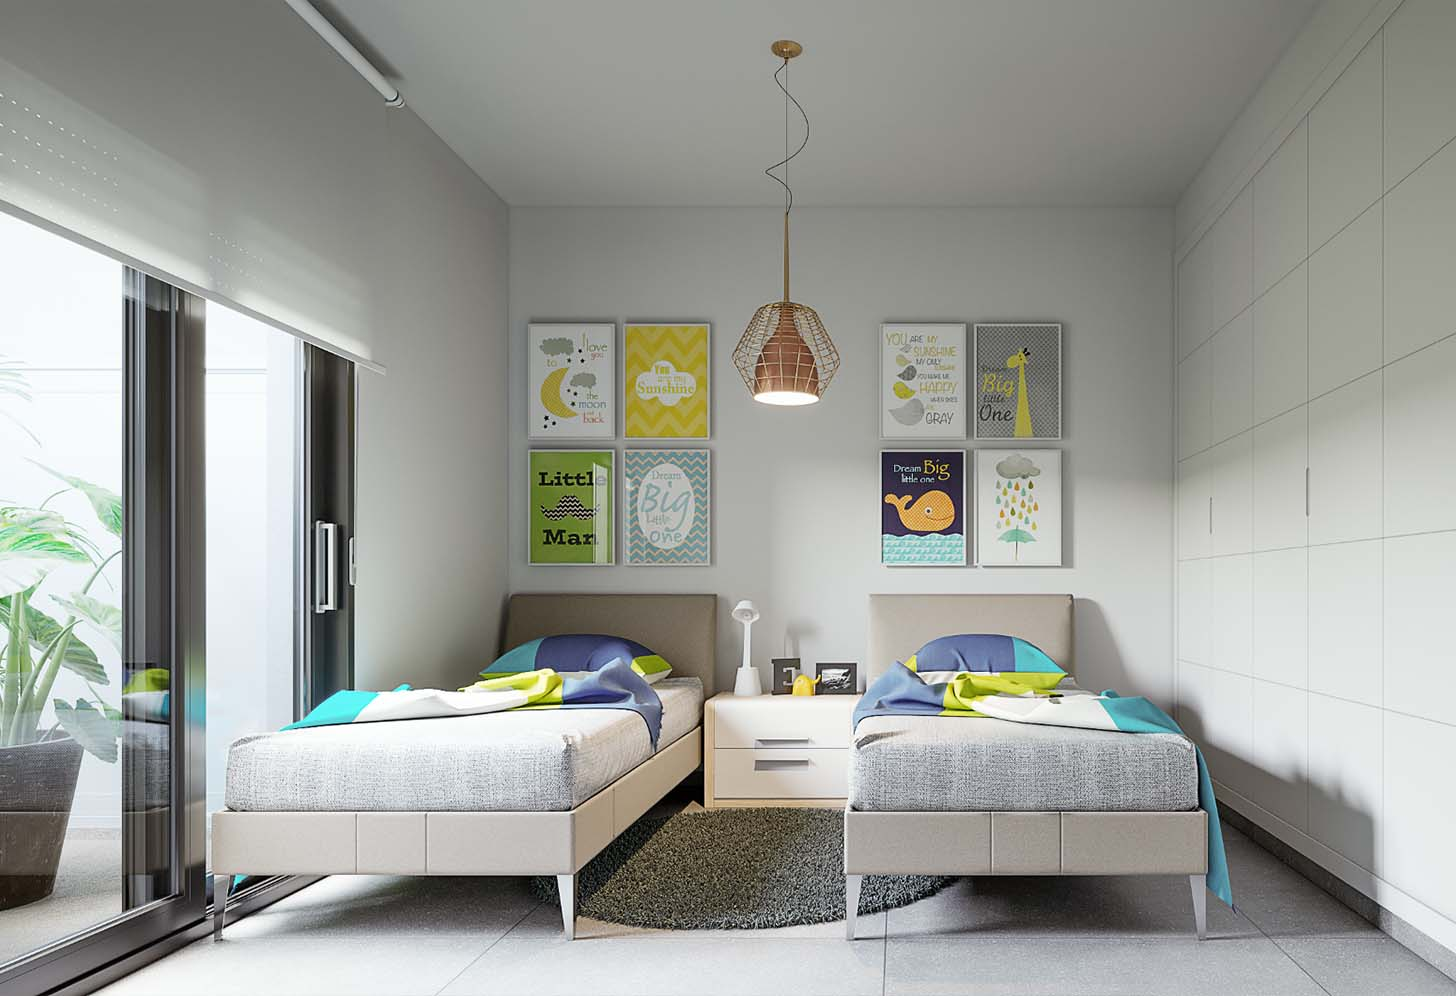 immobilier neuf espagne costa blanca on-d15 palmeral roda golf chambre 2